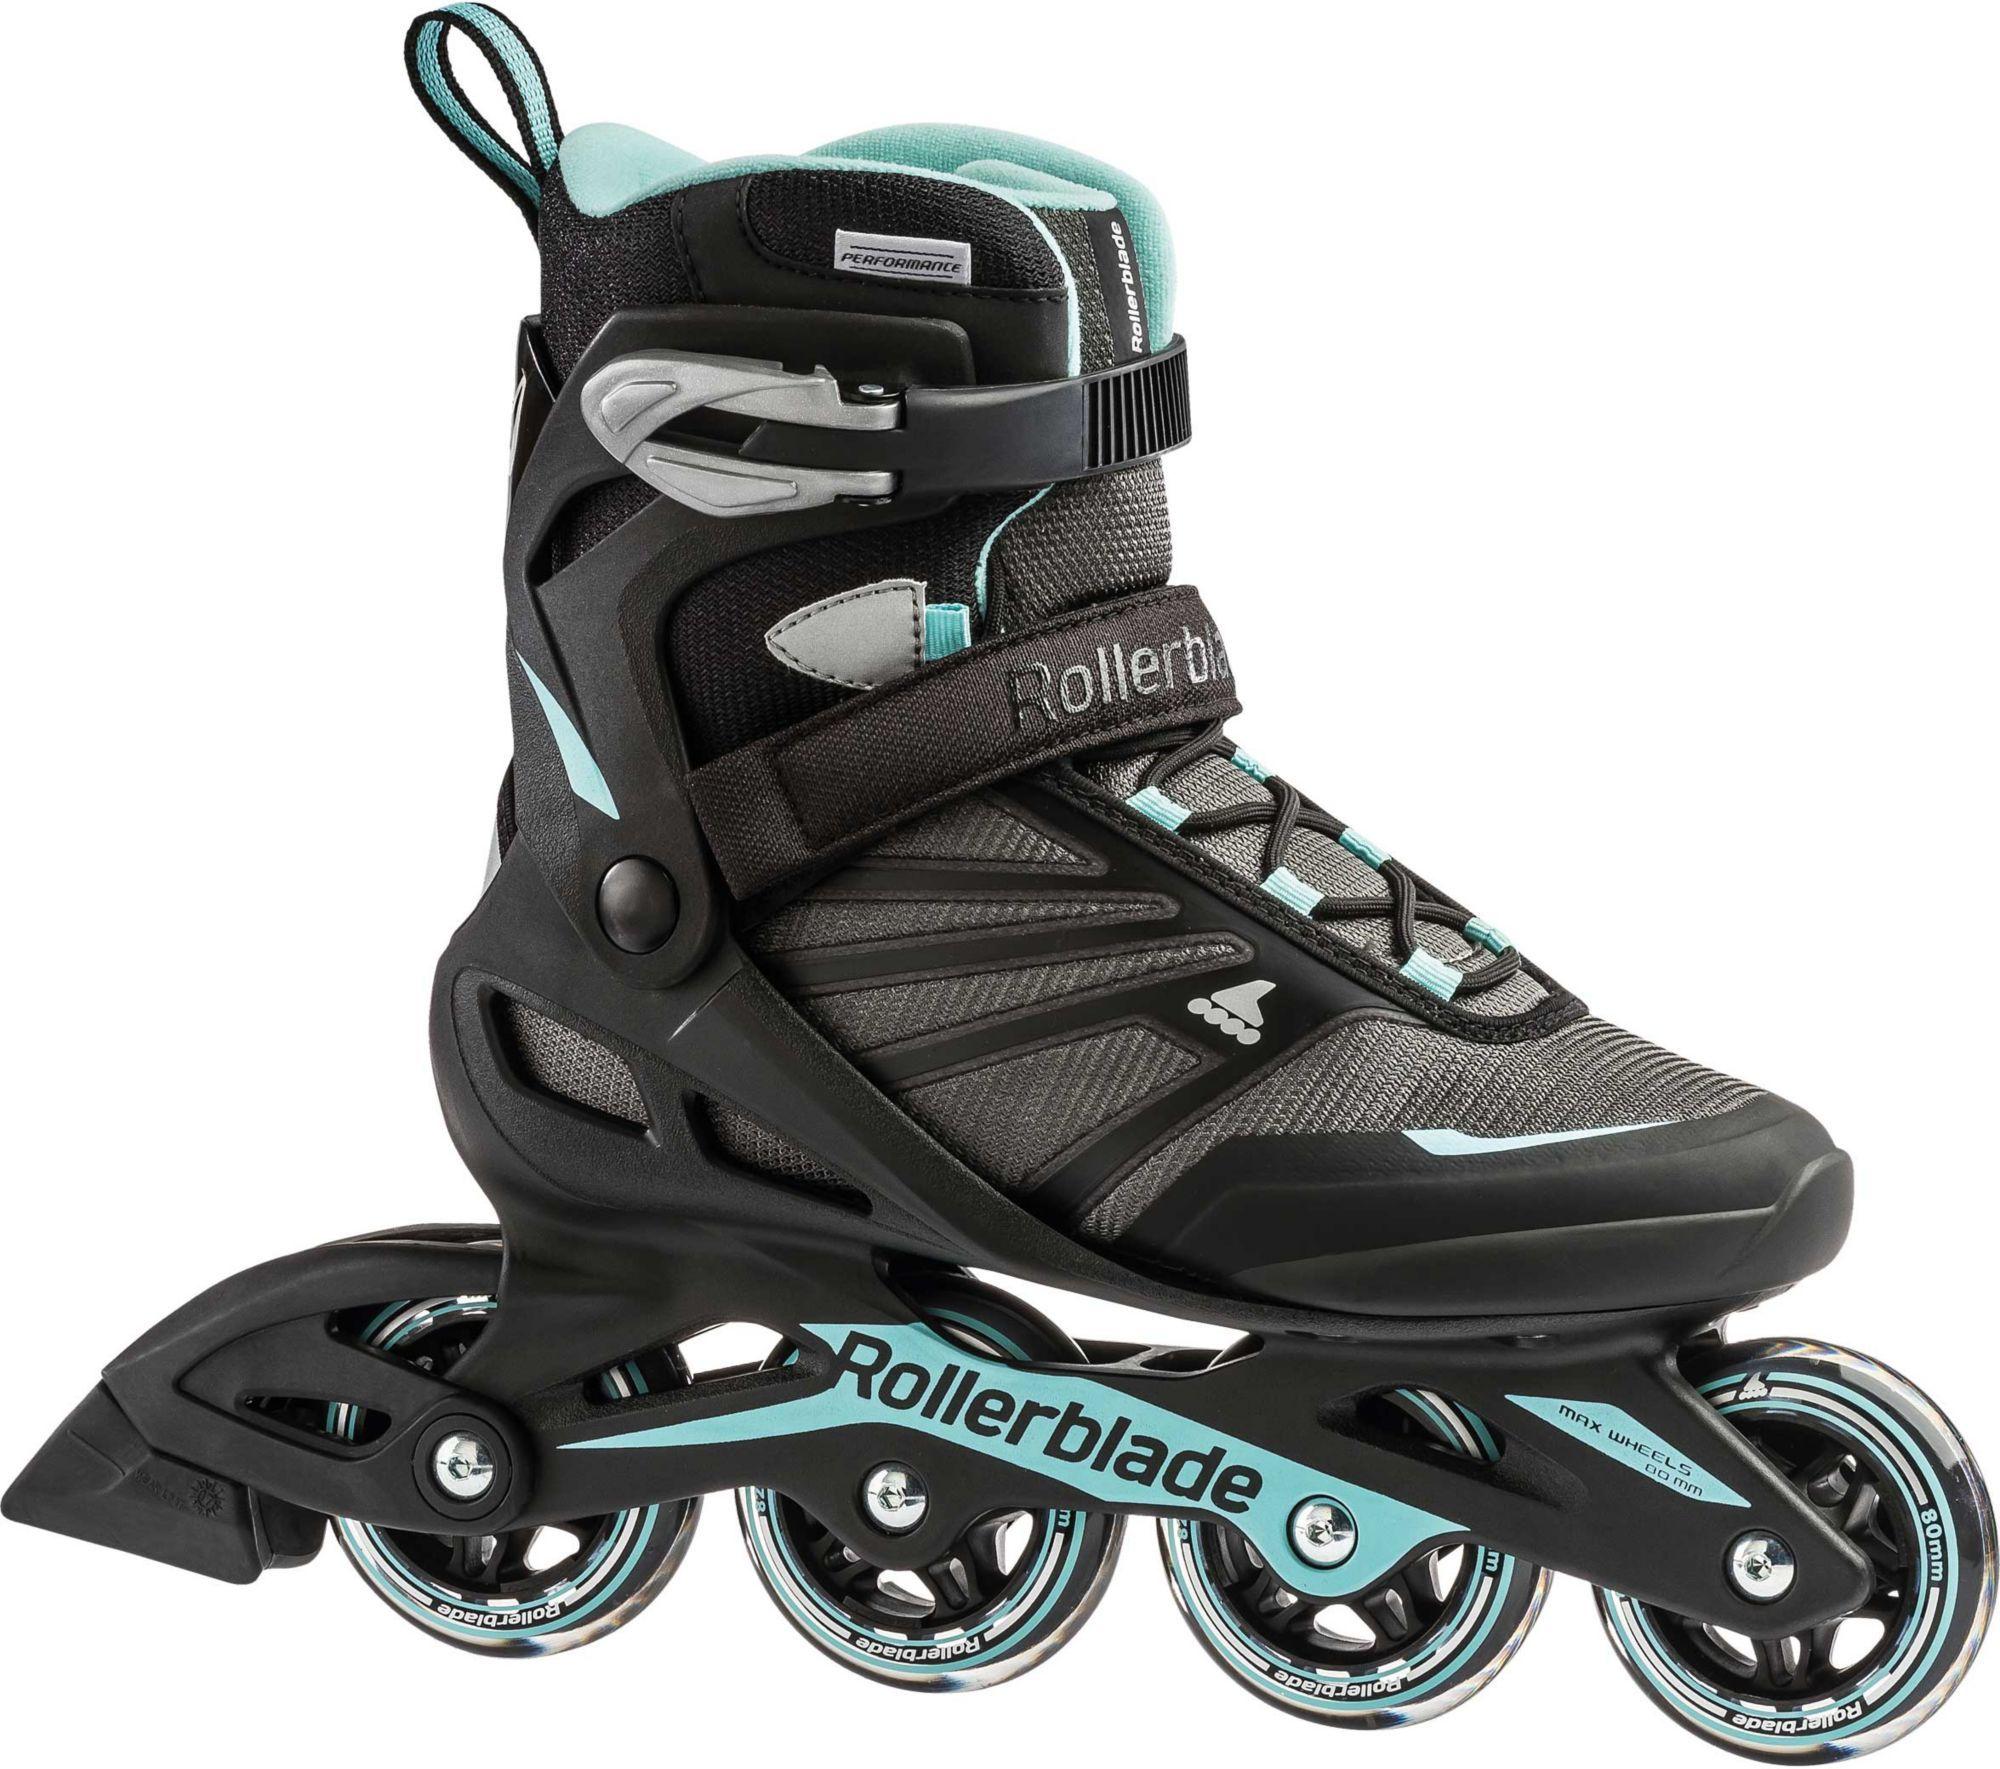 31c40f02d6f Rollerblade Women's Zetrablade Inline Skates | Products | Inline ...